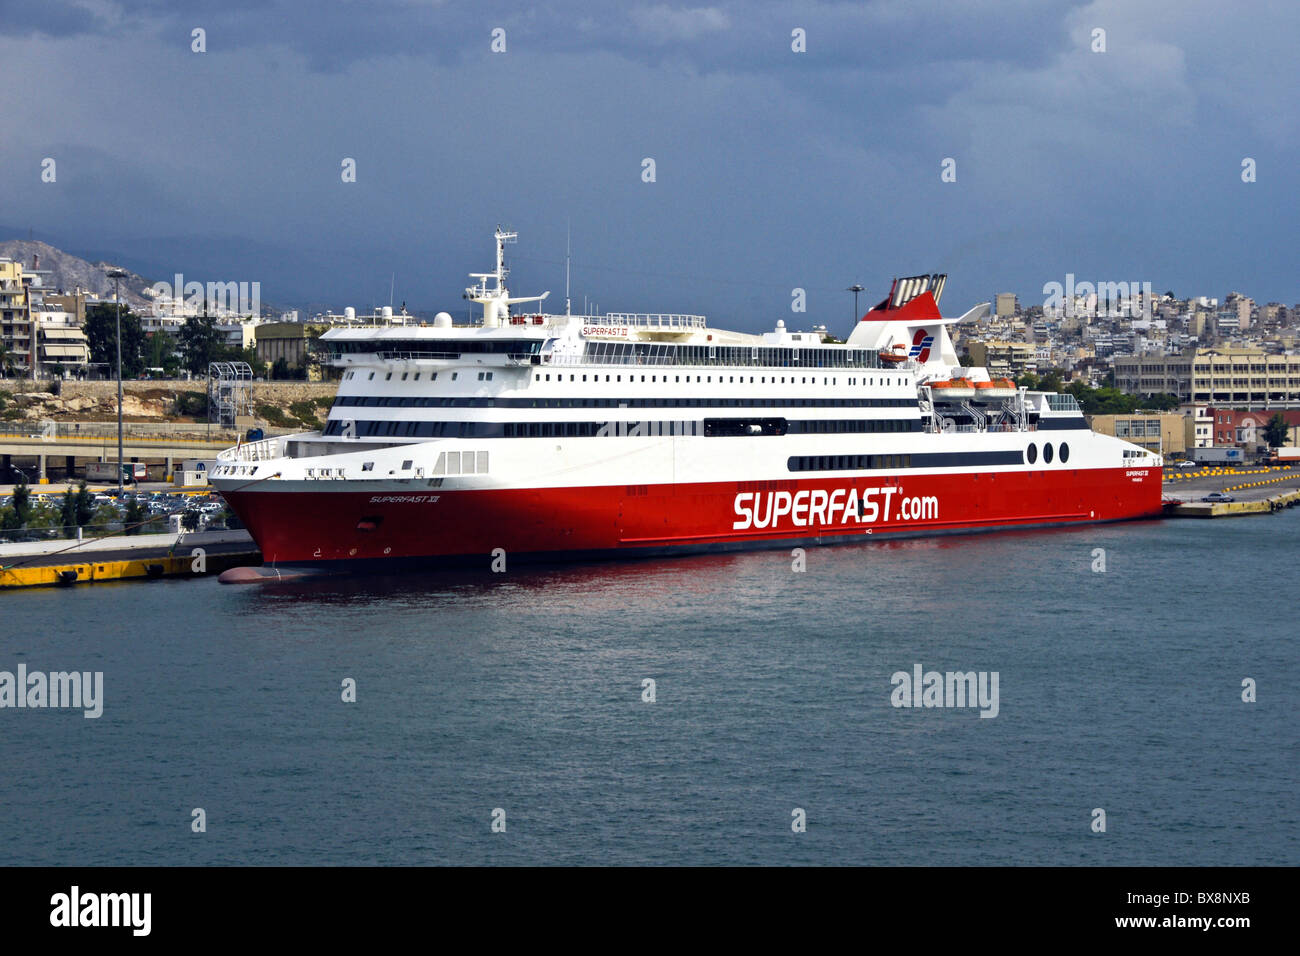 Superfast Ferries passenger car ferry Superfast XI in Piraeus harbour Greece - Stock Image